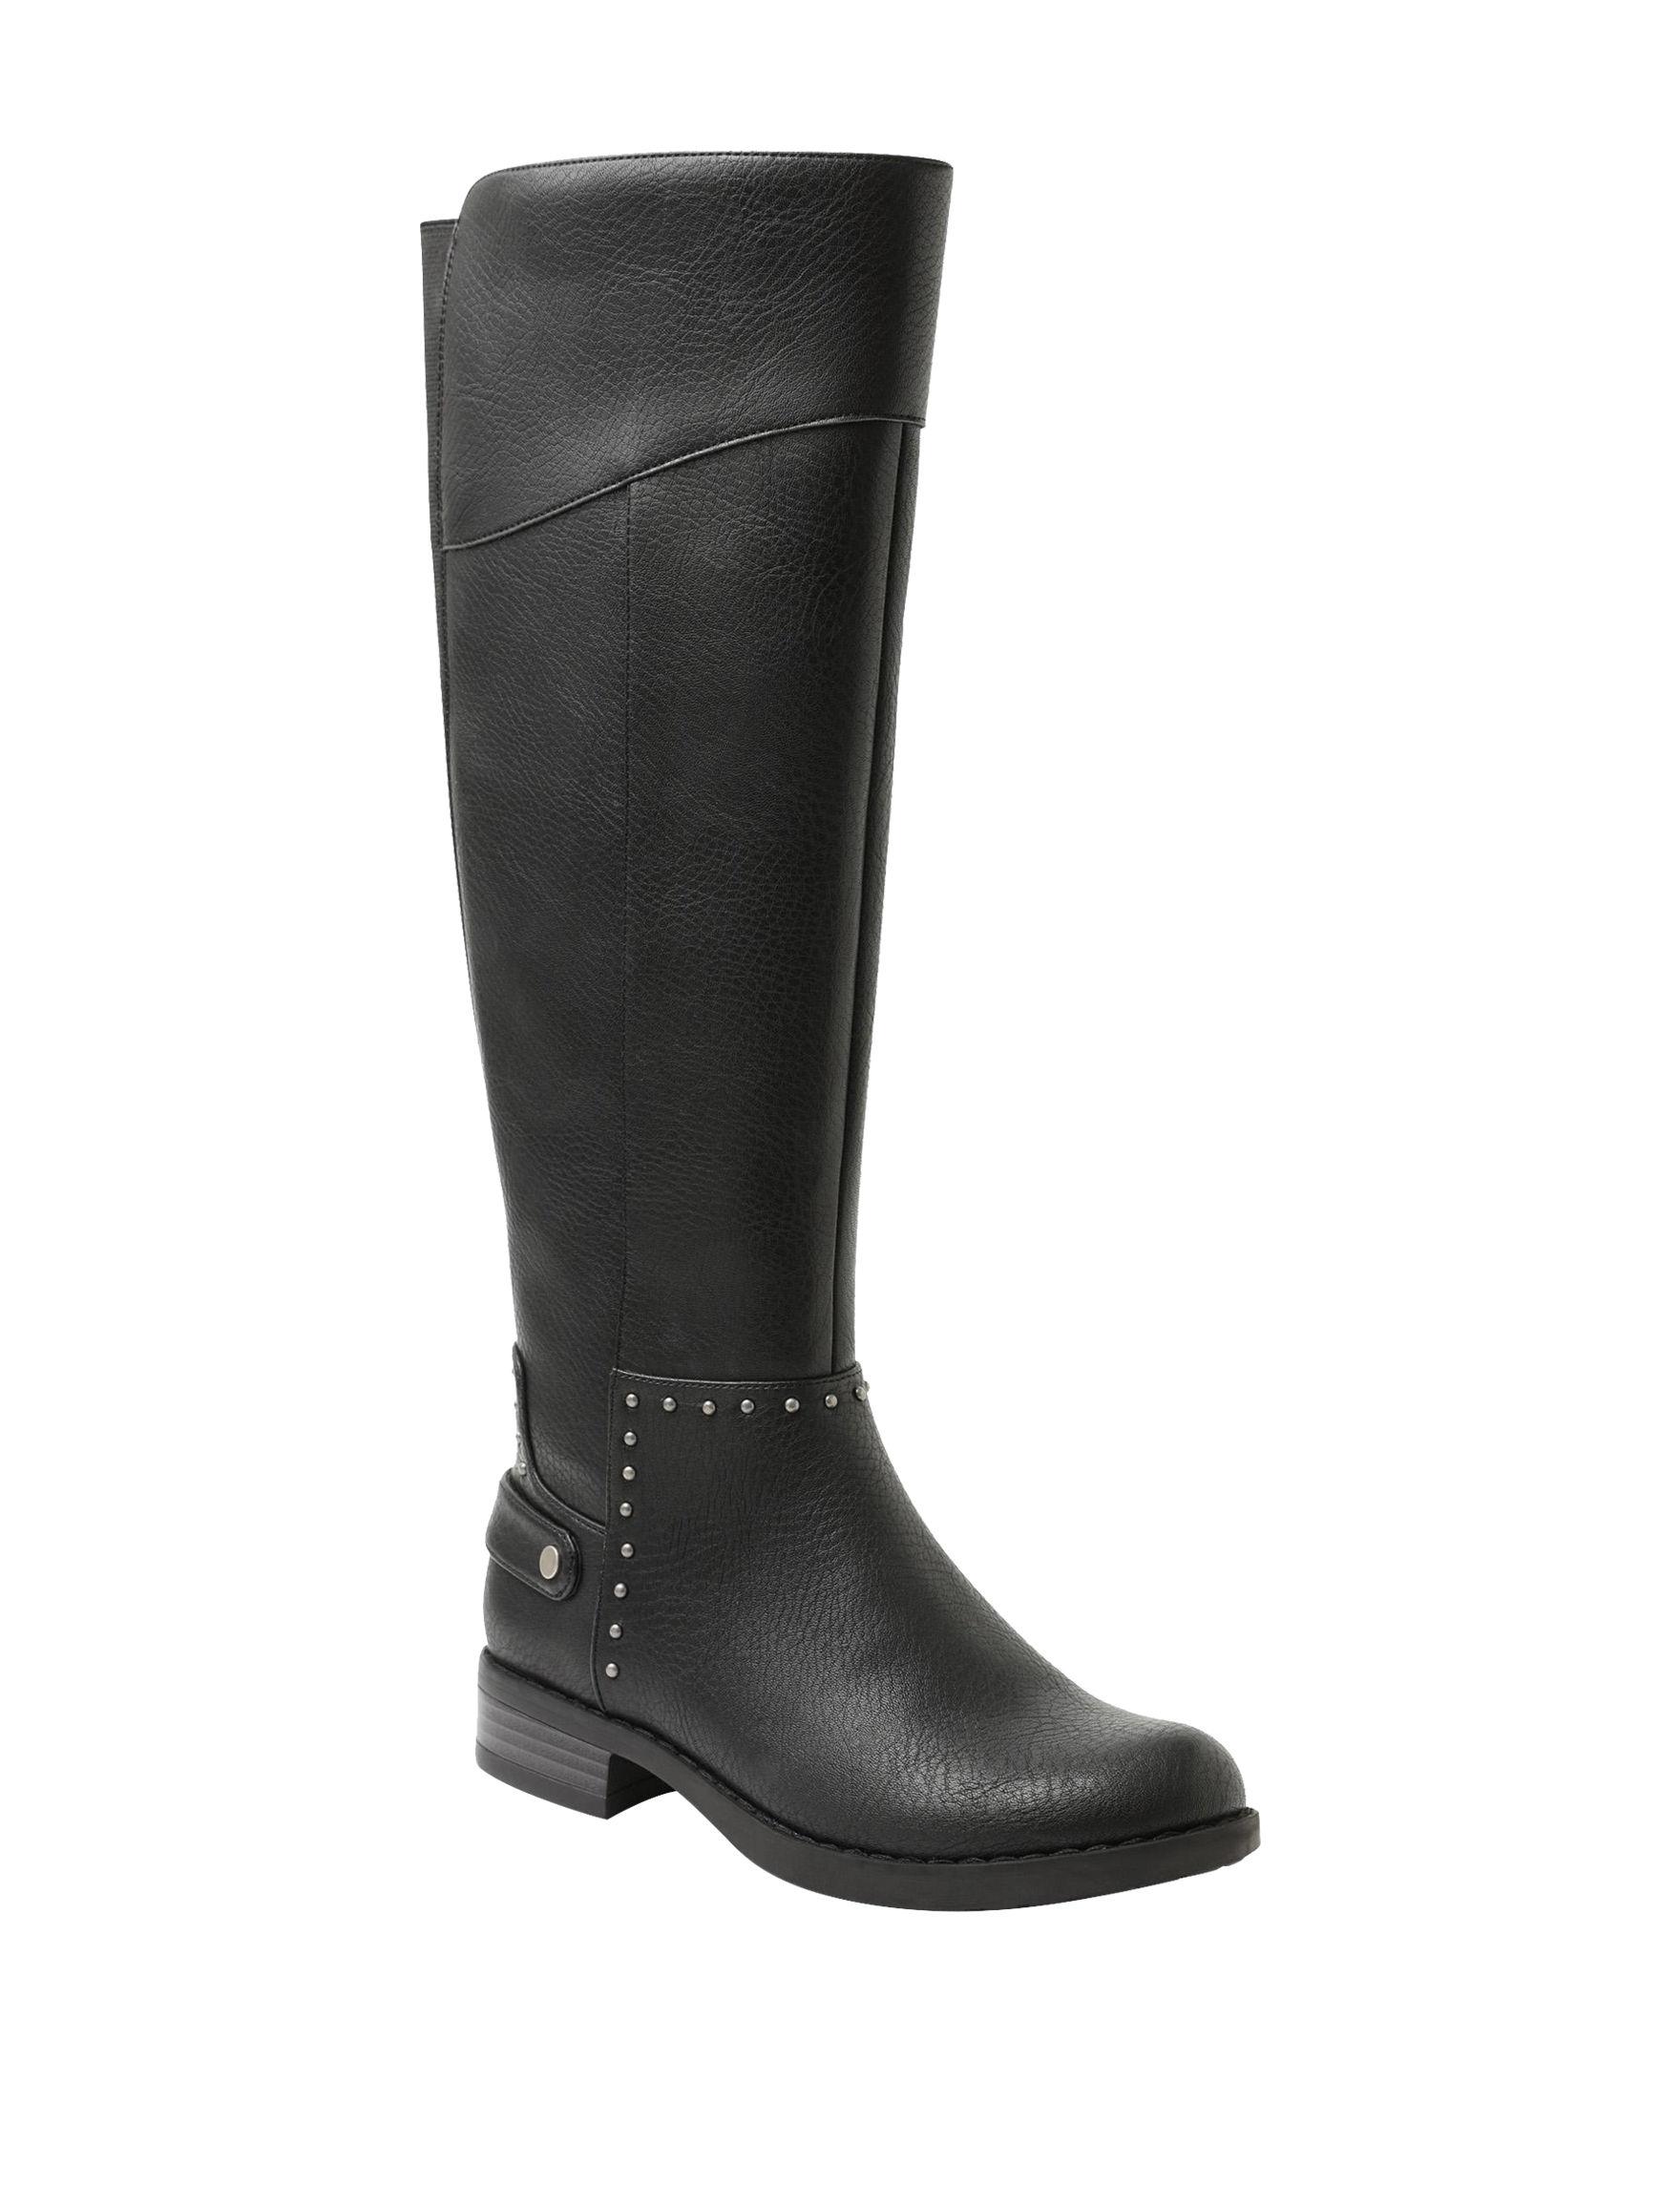 XOXO Black Riding Boots